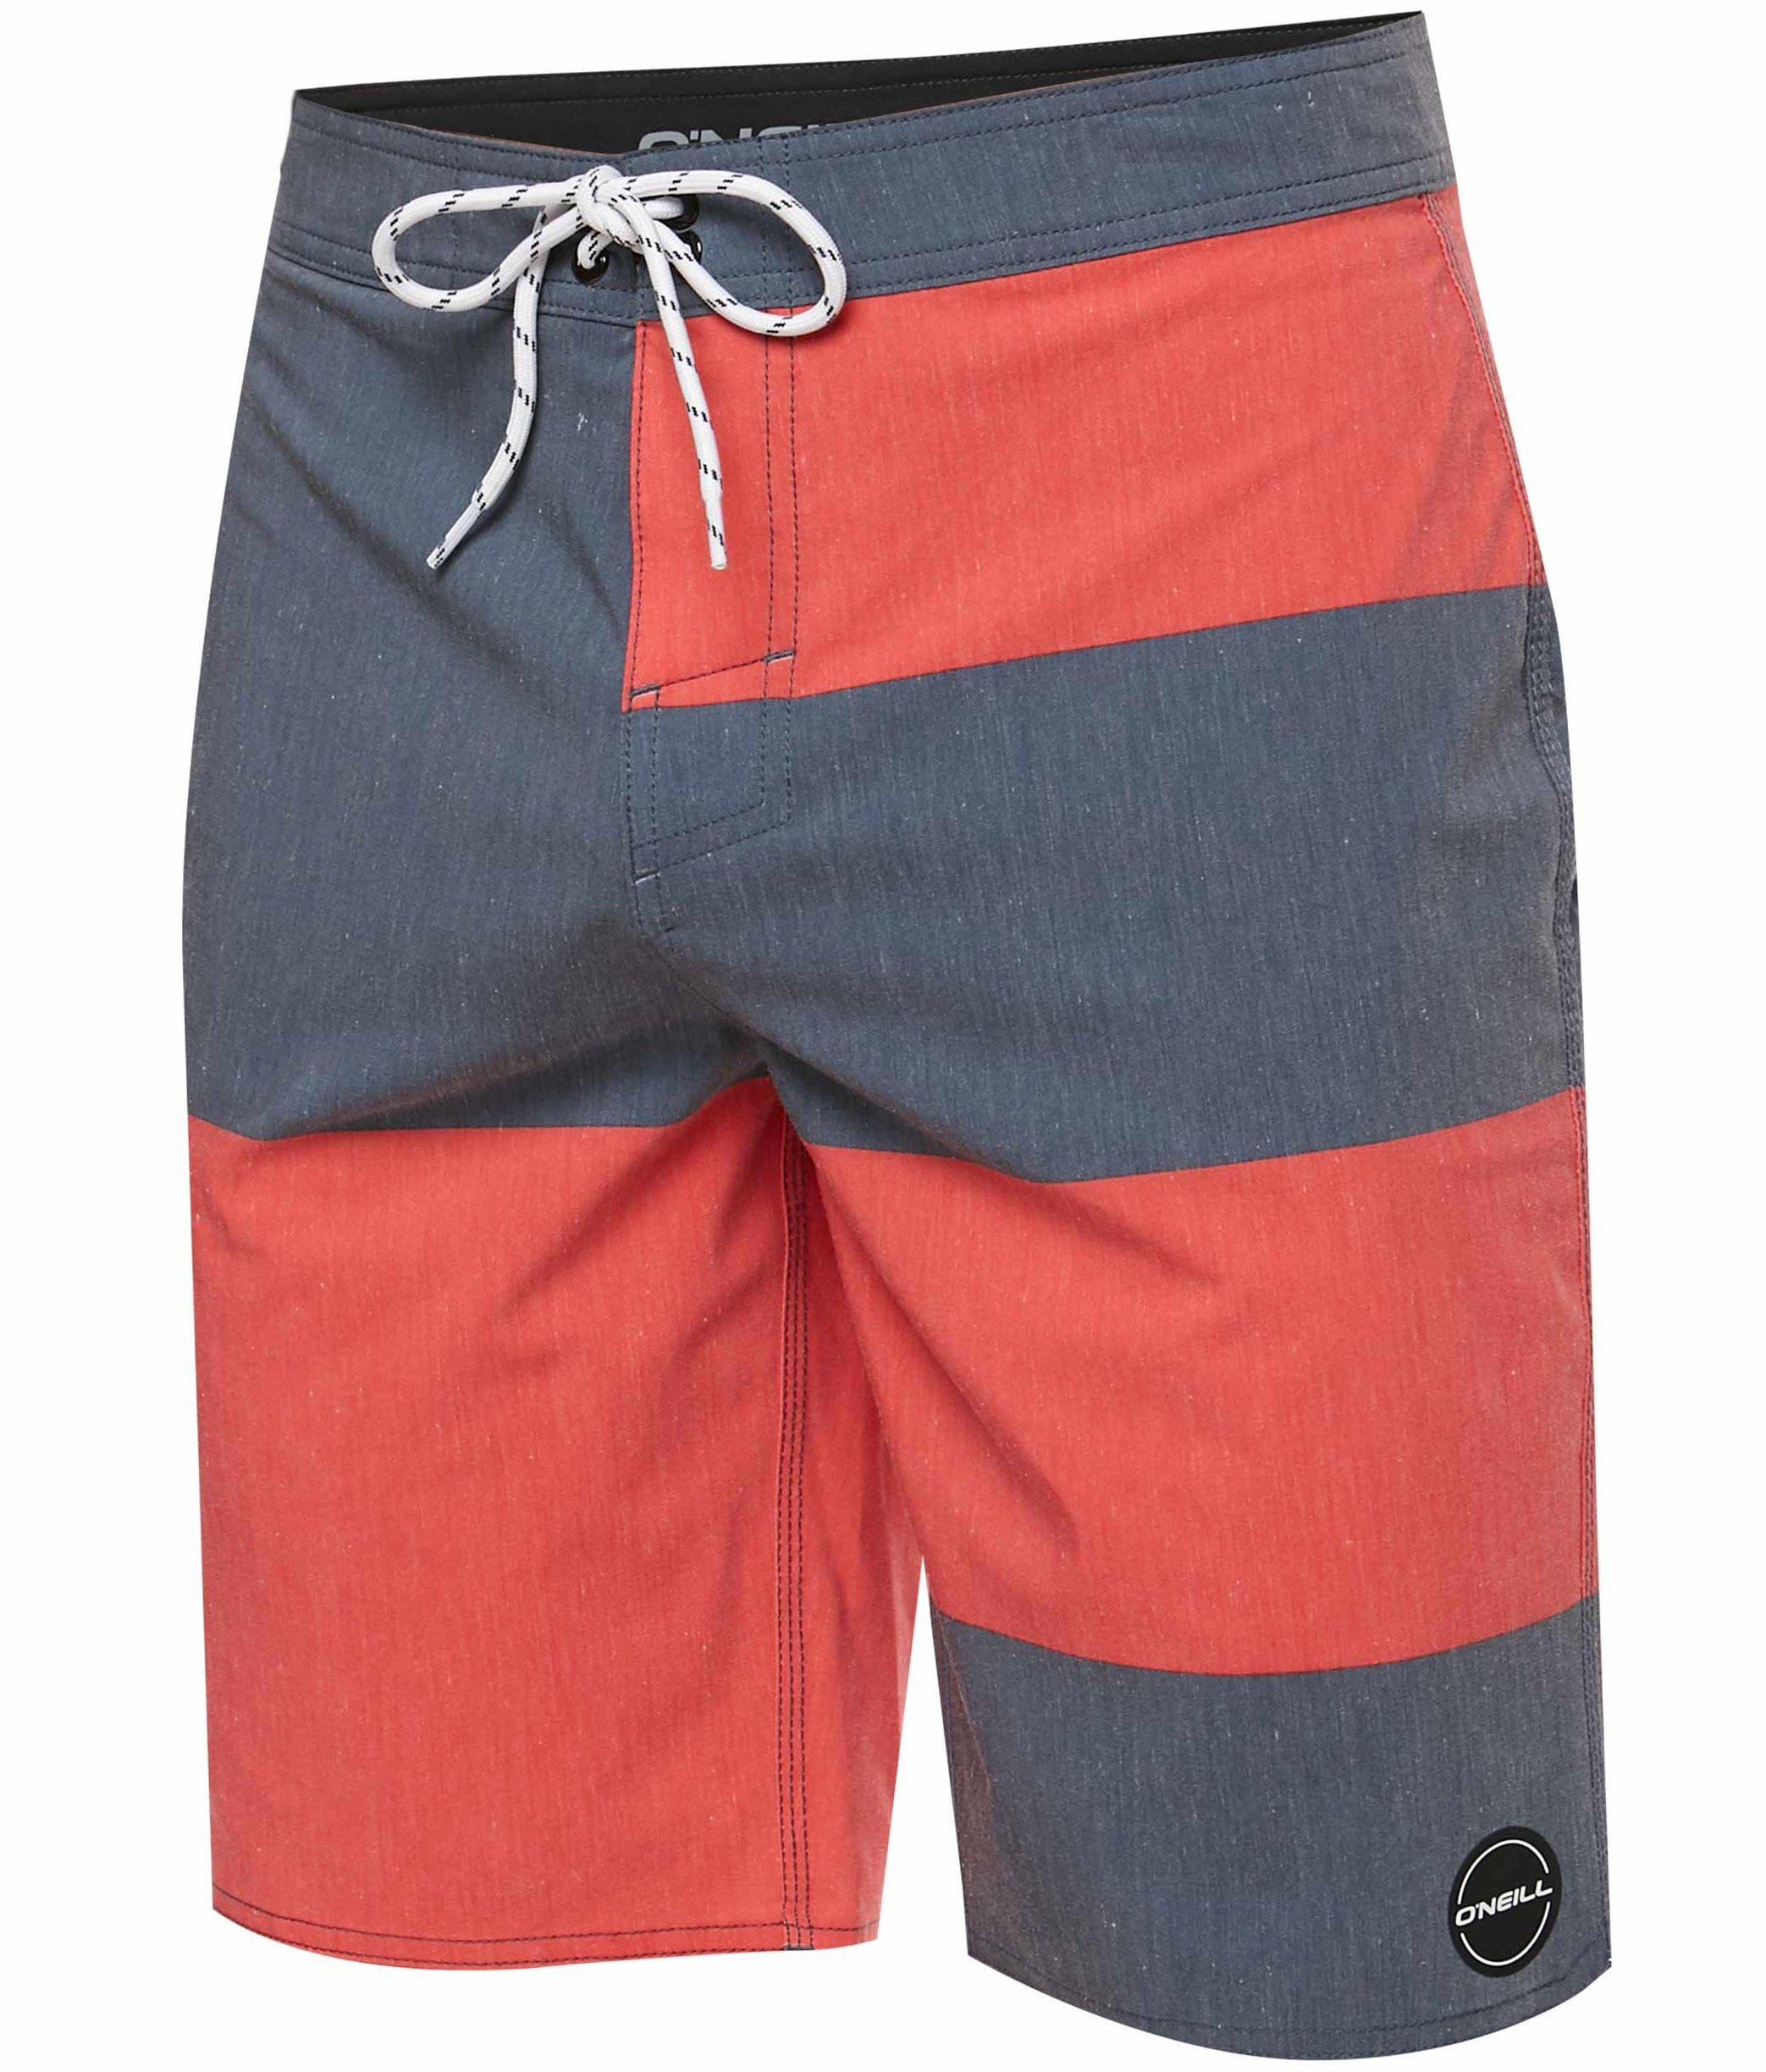 O'Neill Men's Hyperfreak Heist Informant Boardshort - Informant Red, Size 34